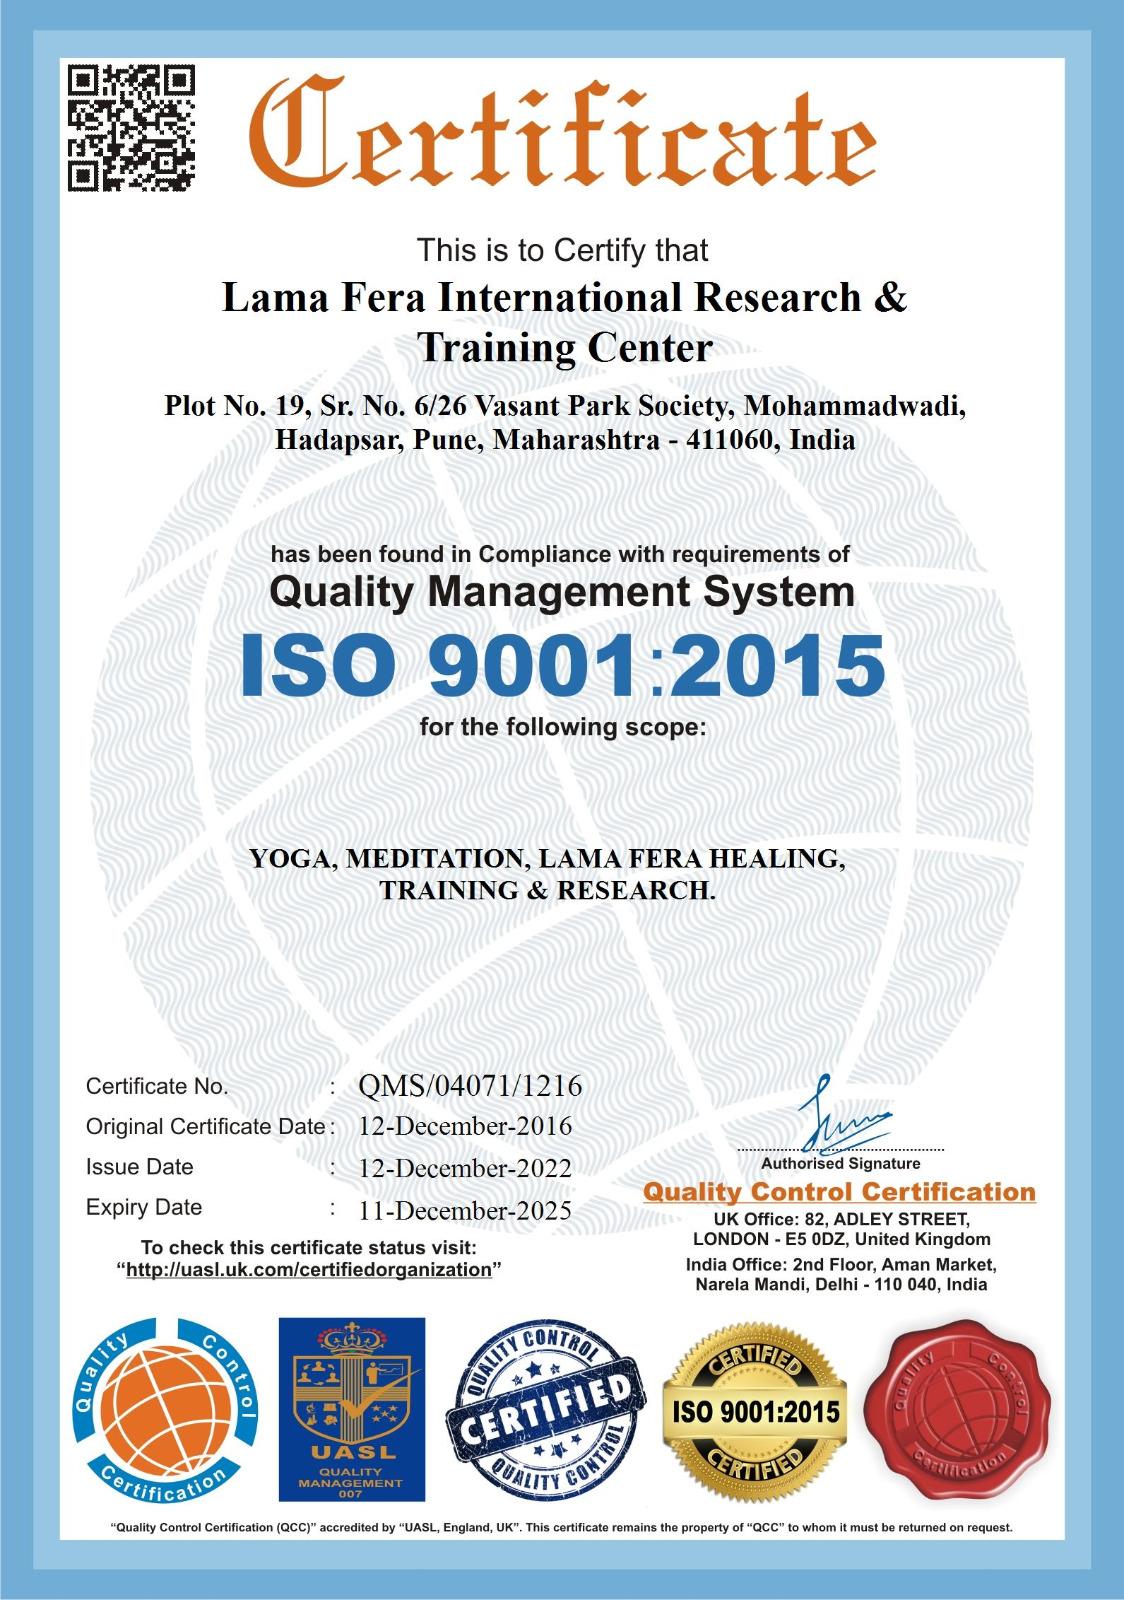 Lama Fera International Research & Training Centre:is India's